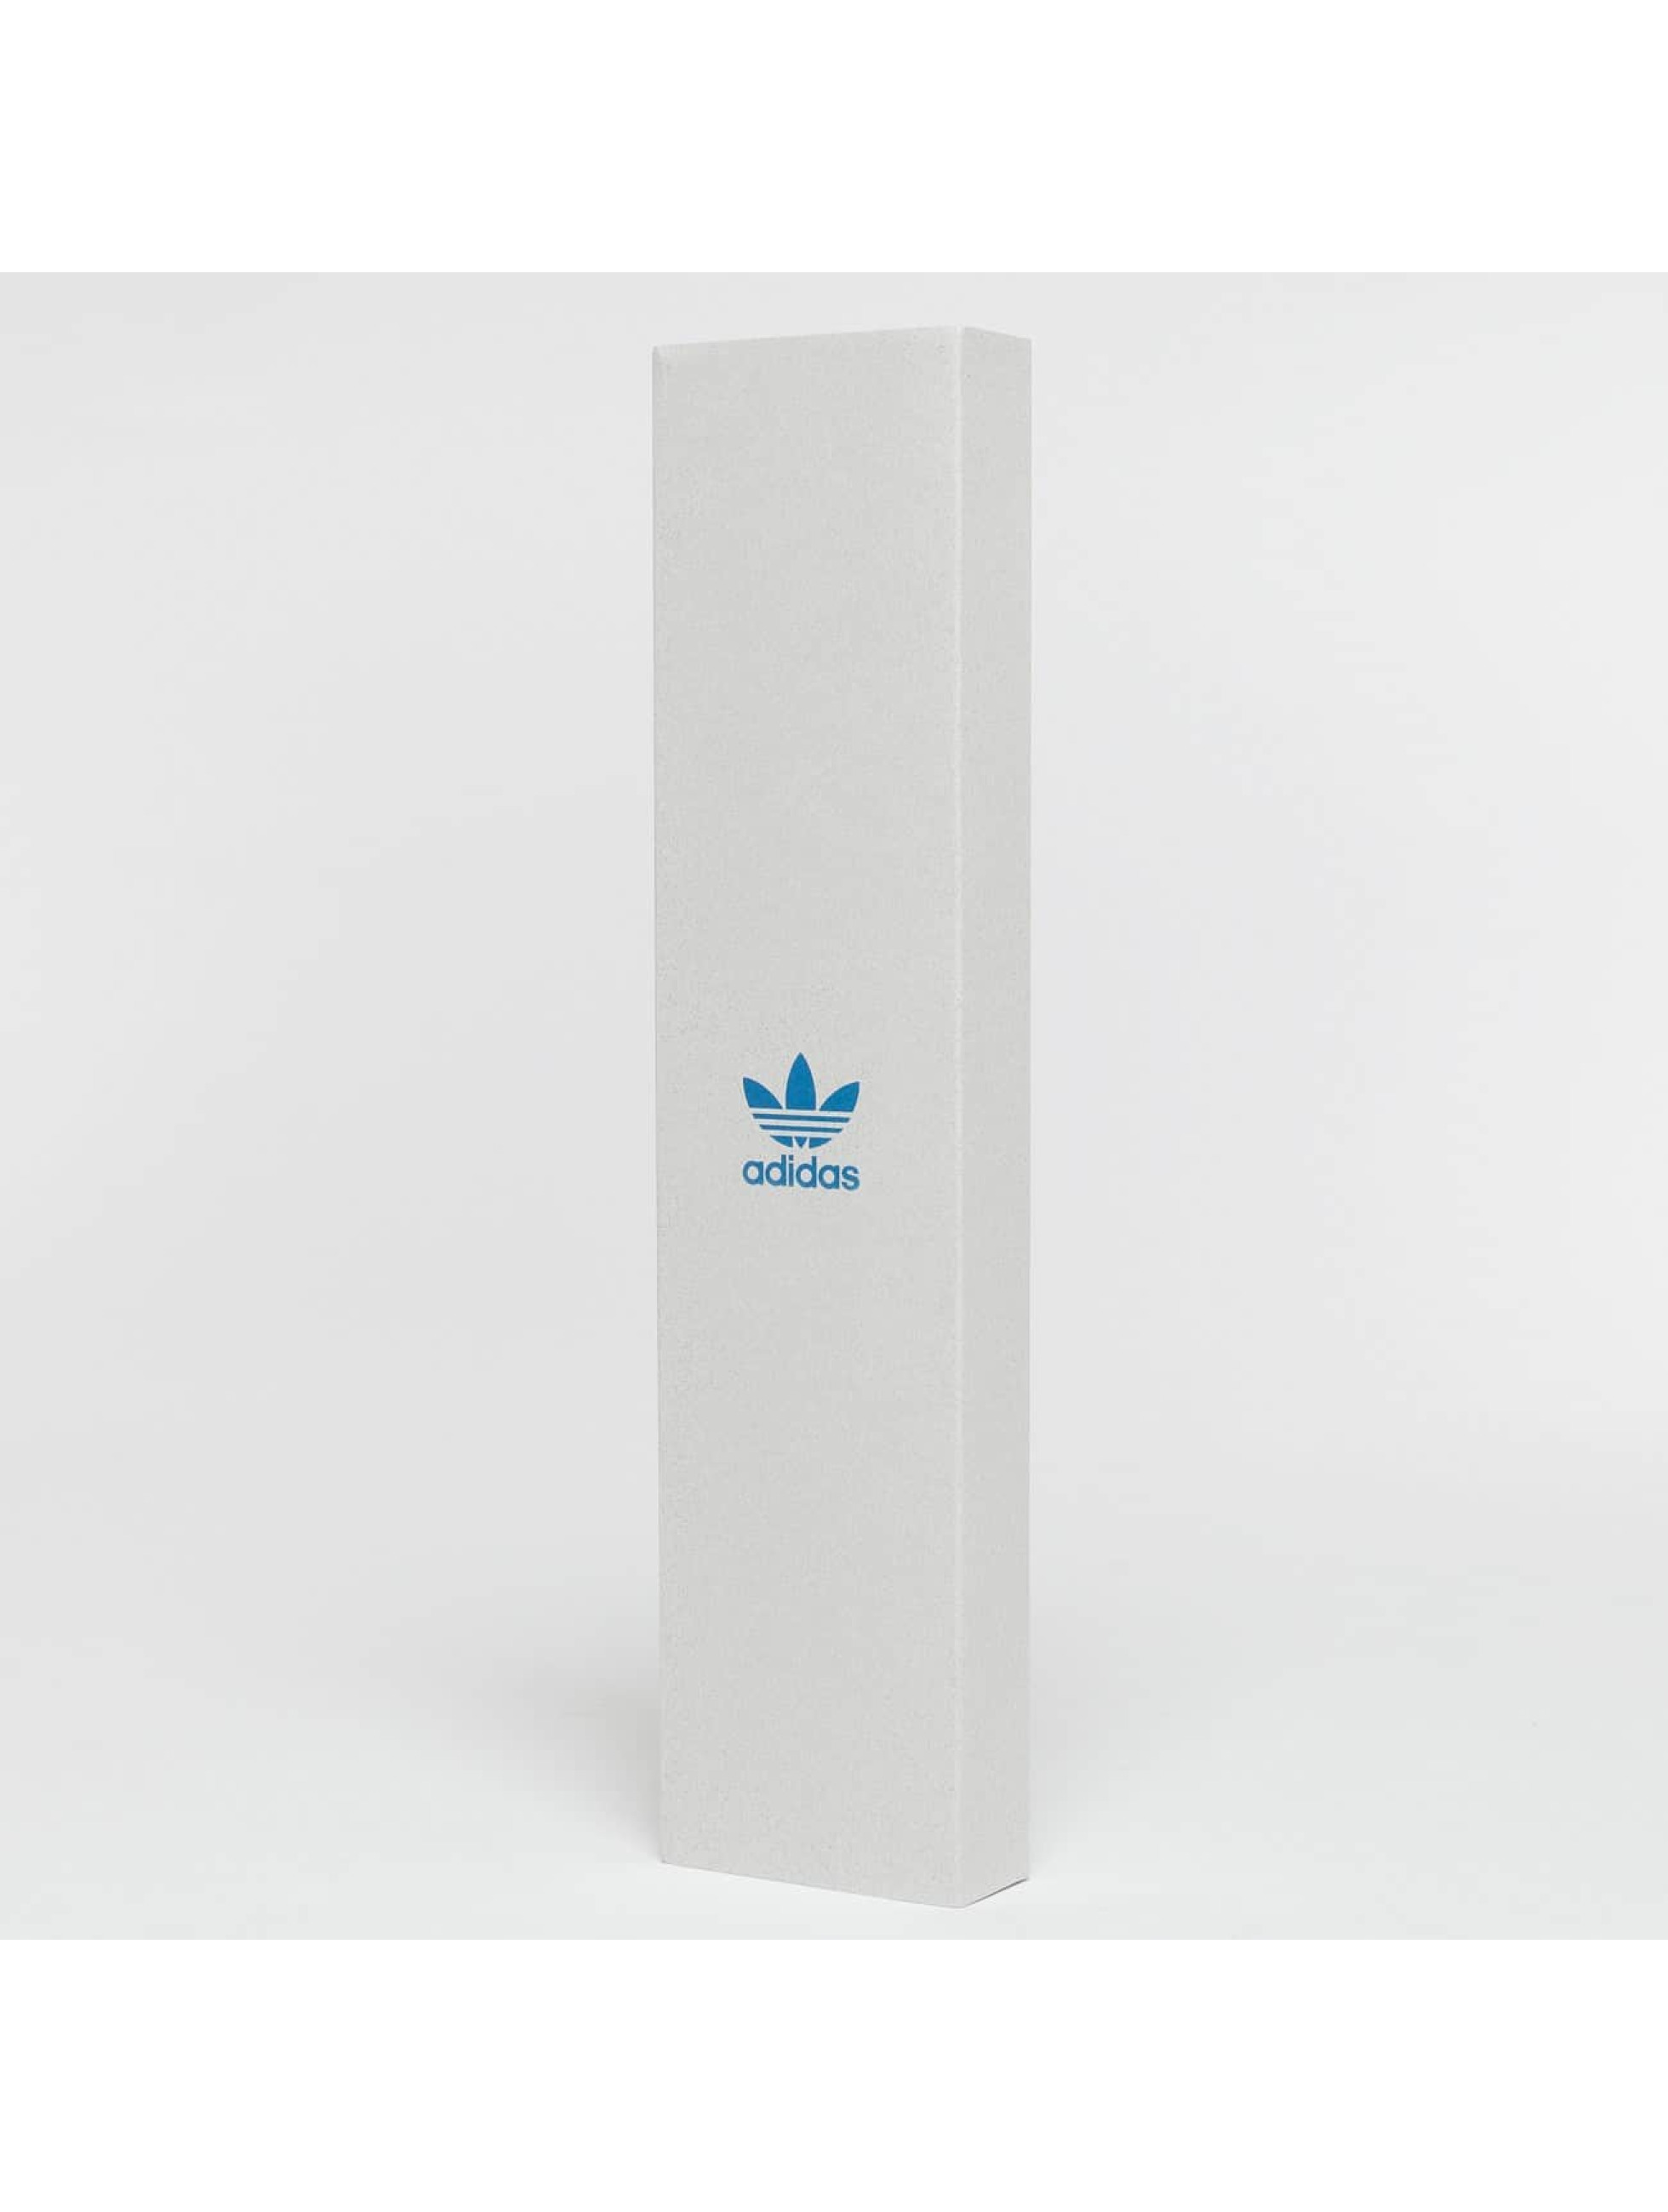 Adidas Watches Kellot District L1 musta